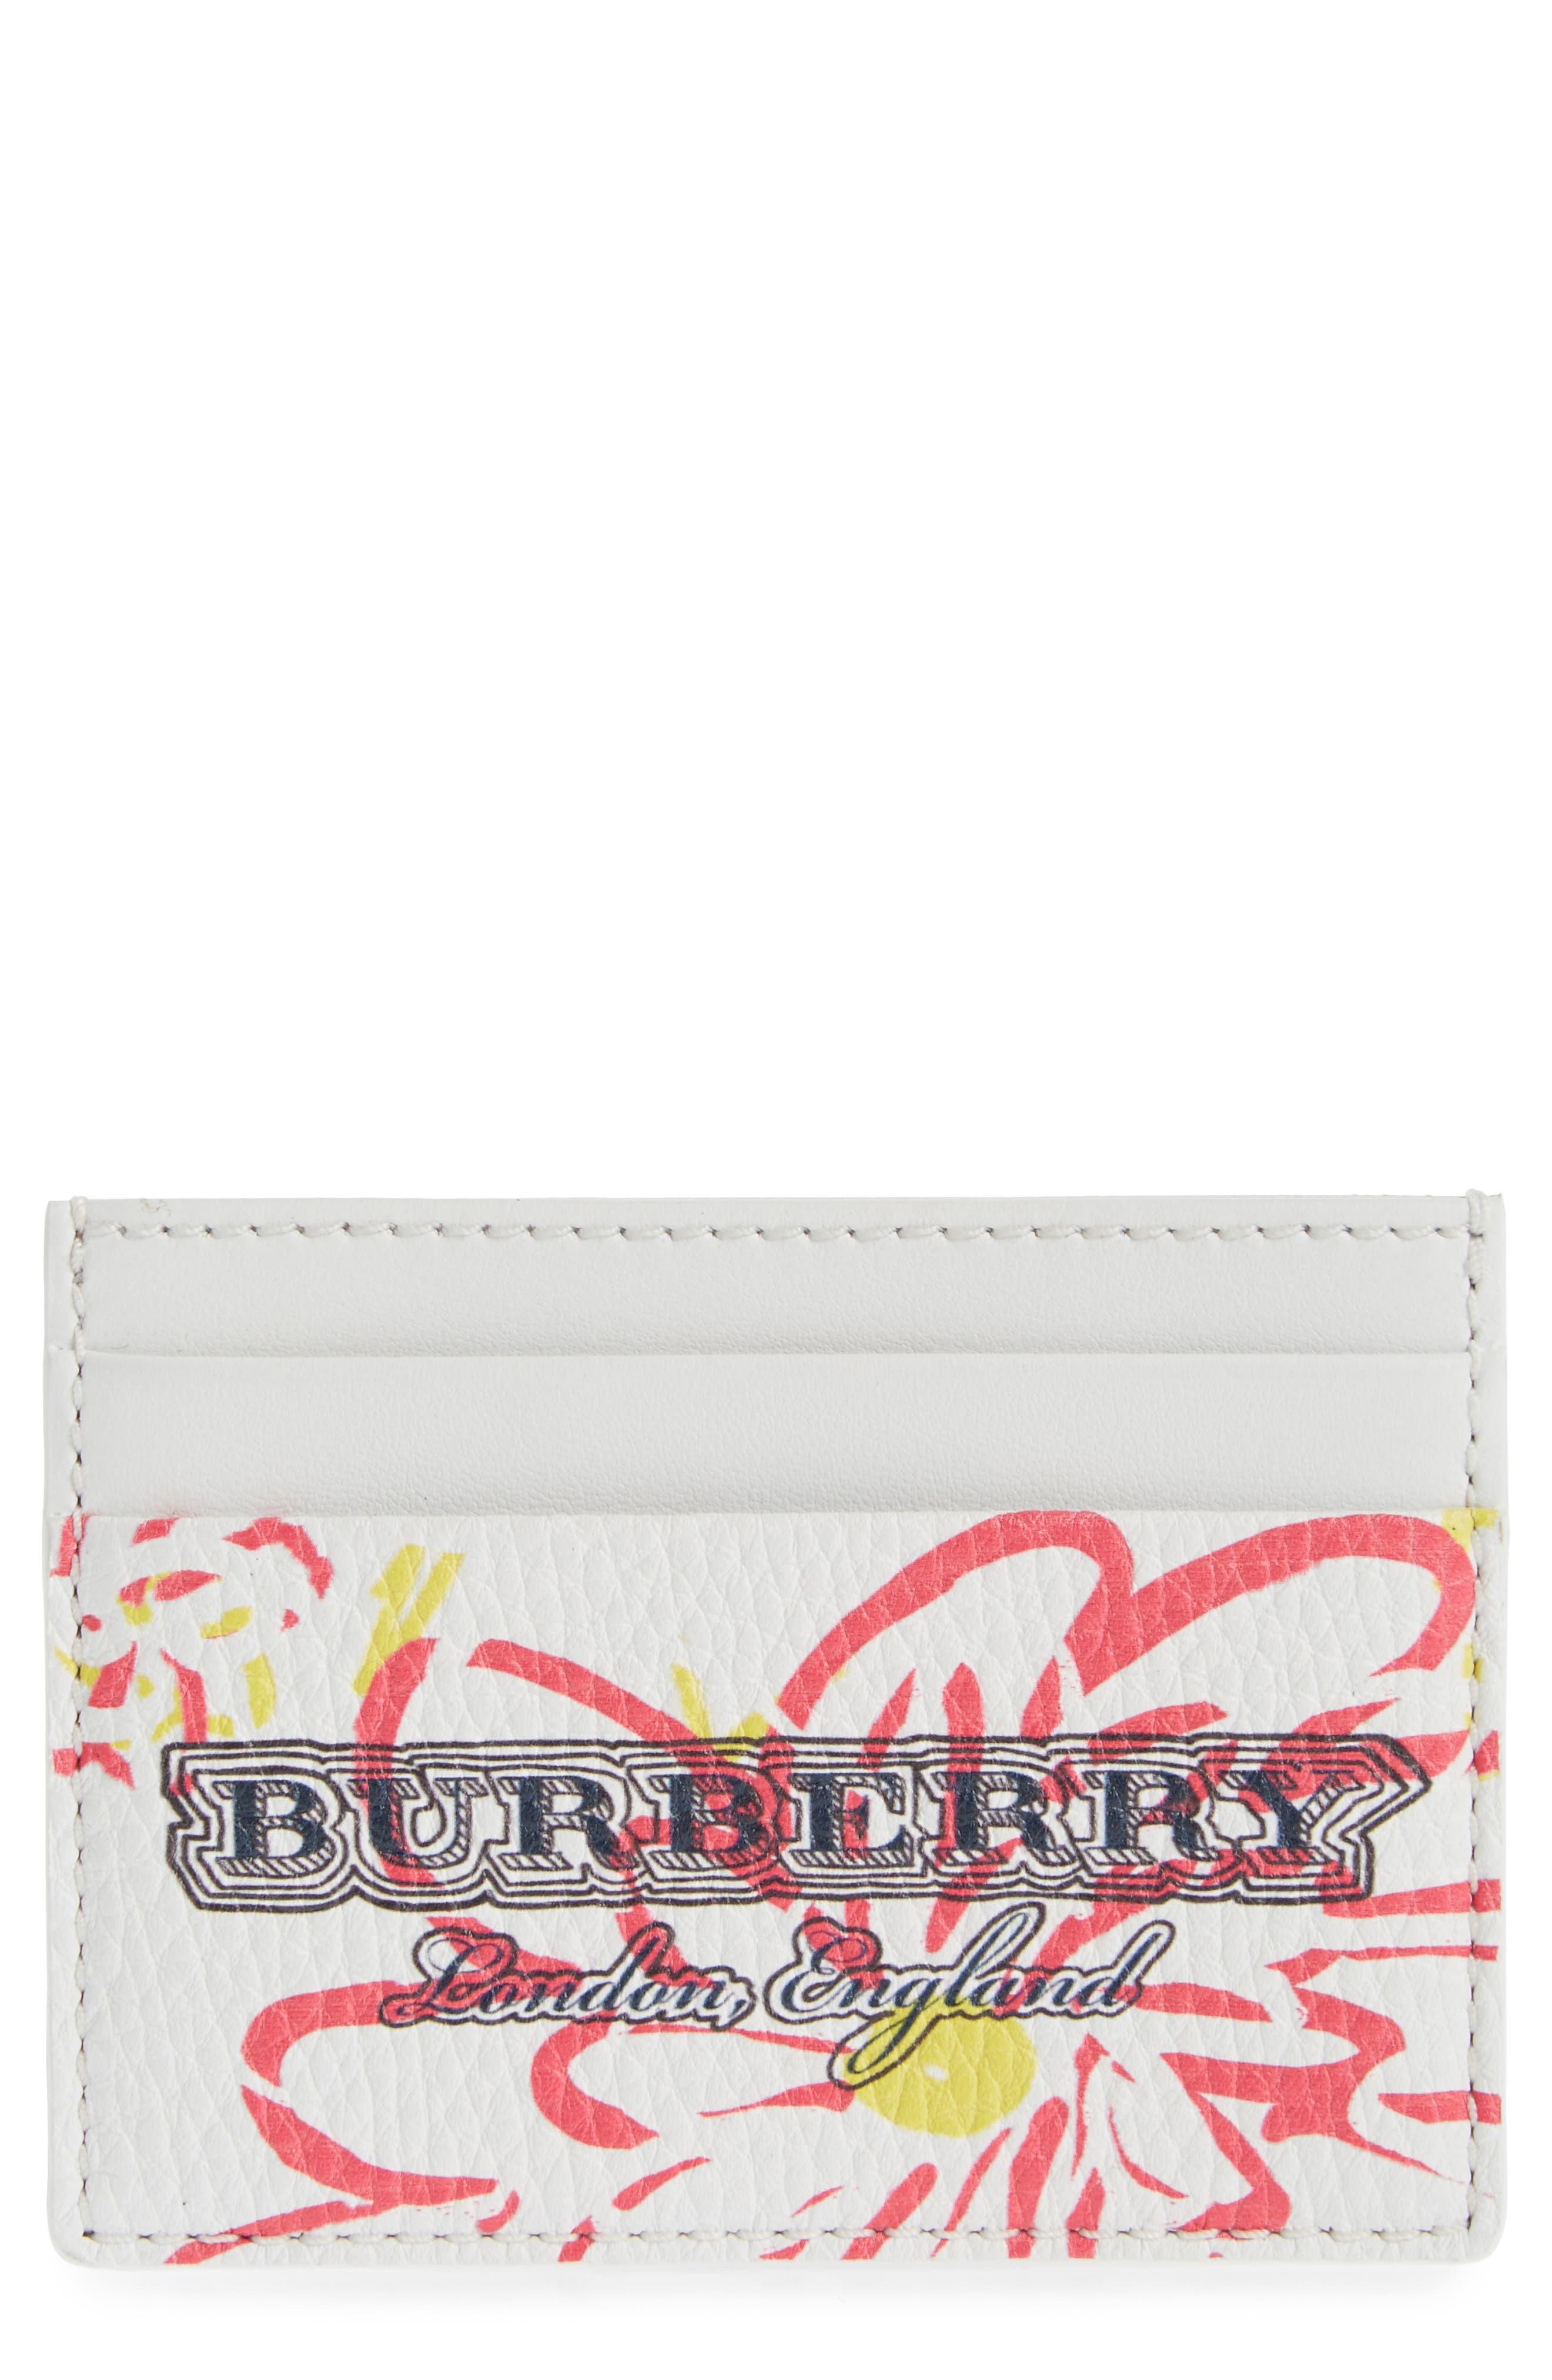 Burberry Sandon Doodle Leather Card Case